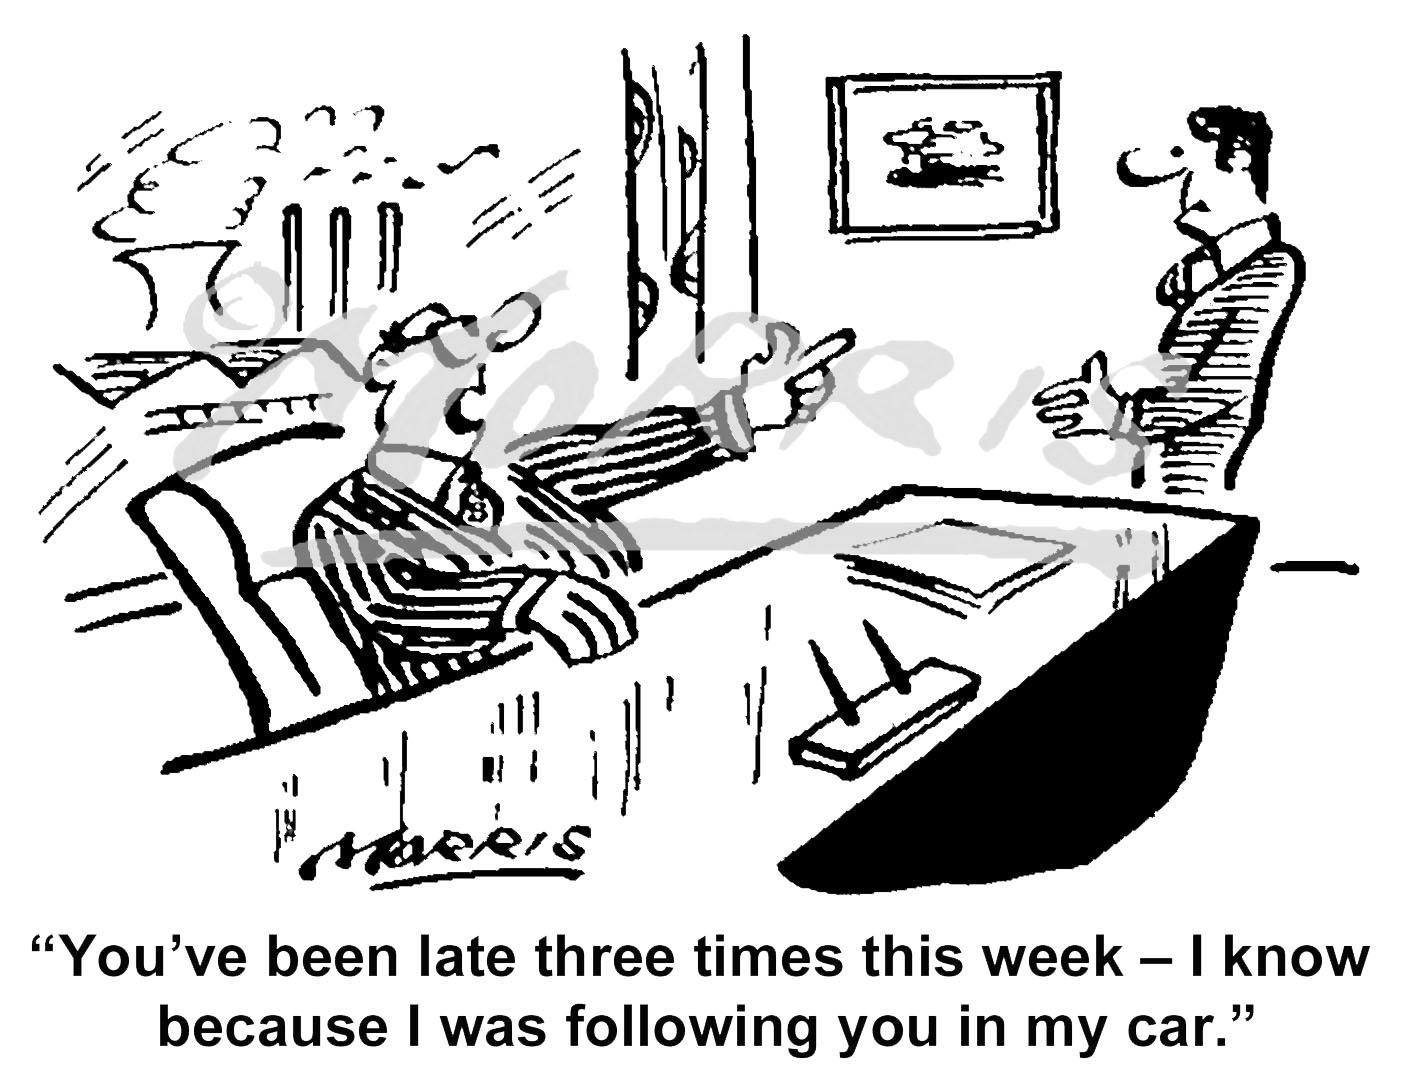 Employee time-keeping cartoon – Ref: 7623bw